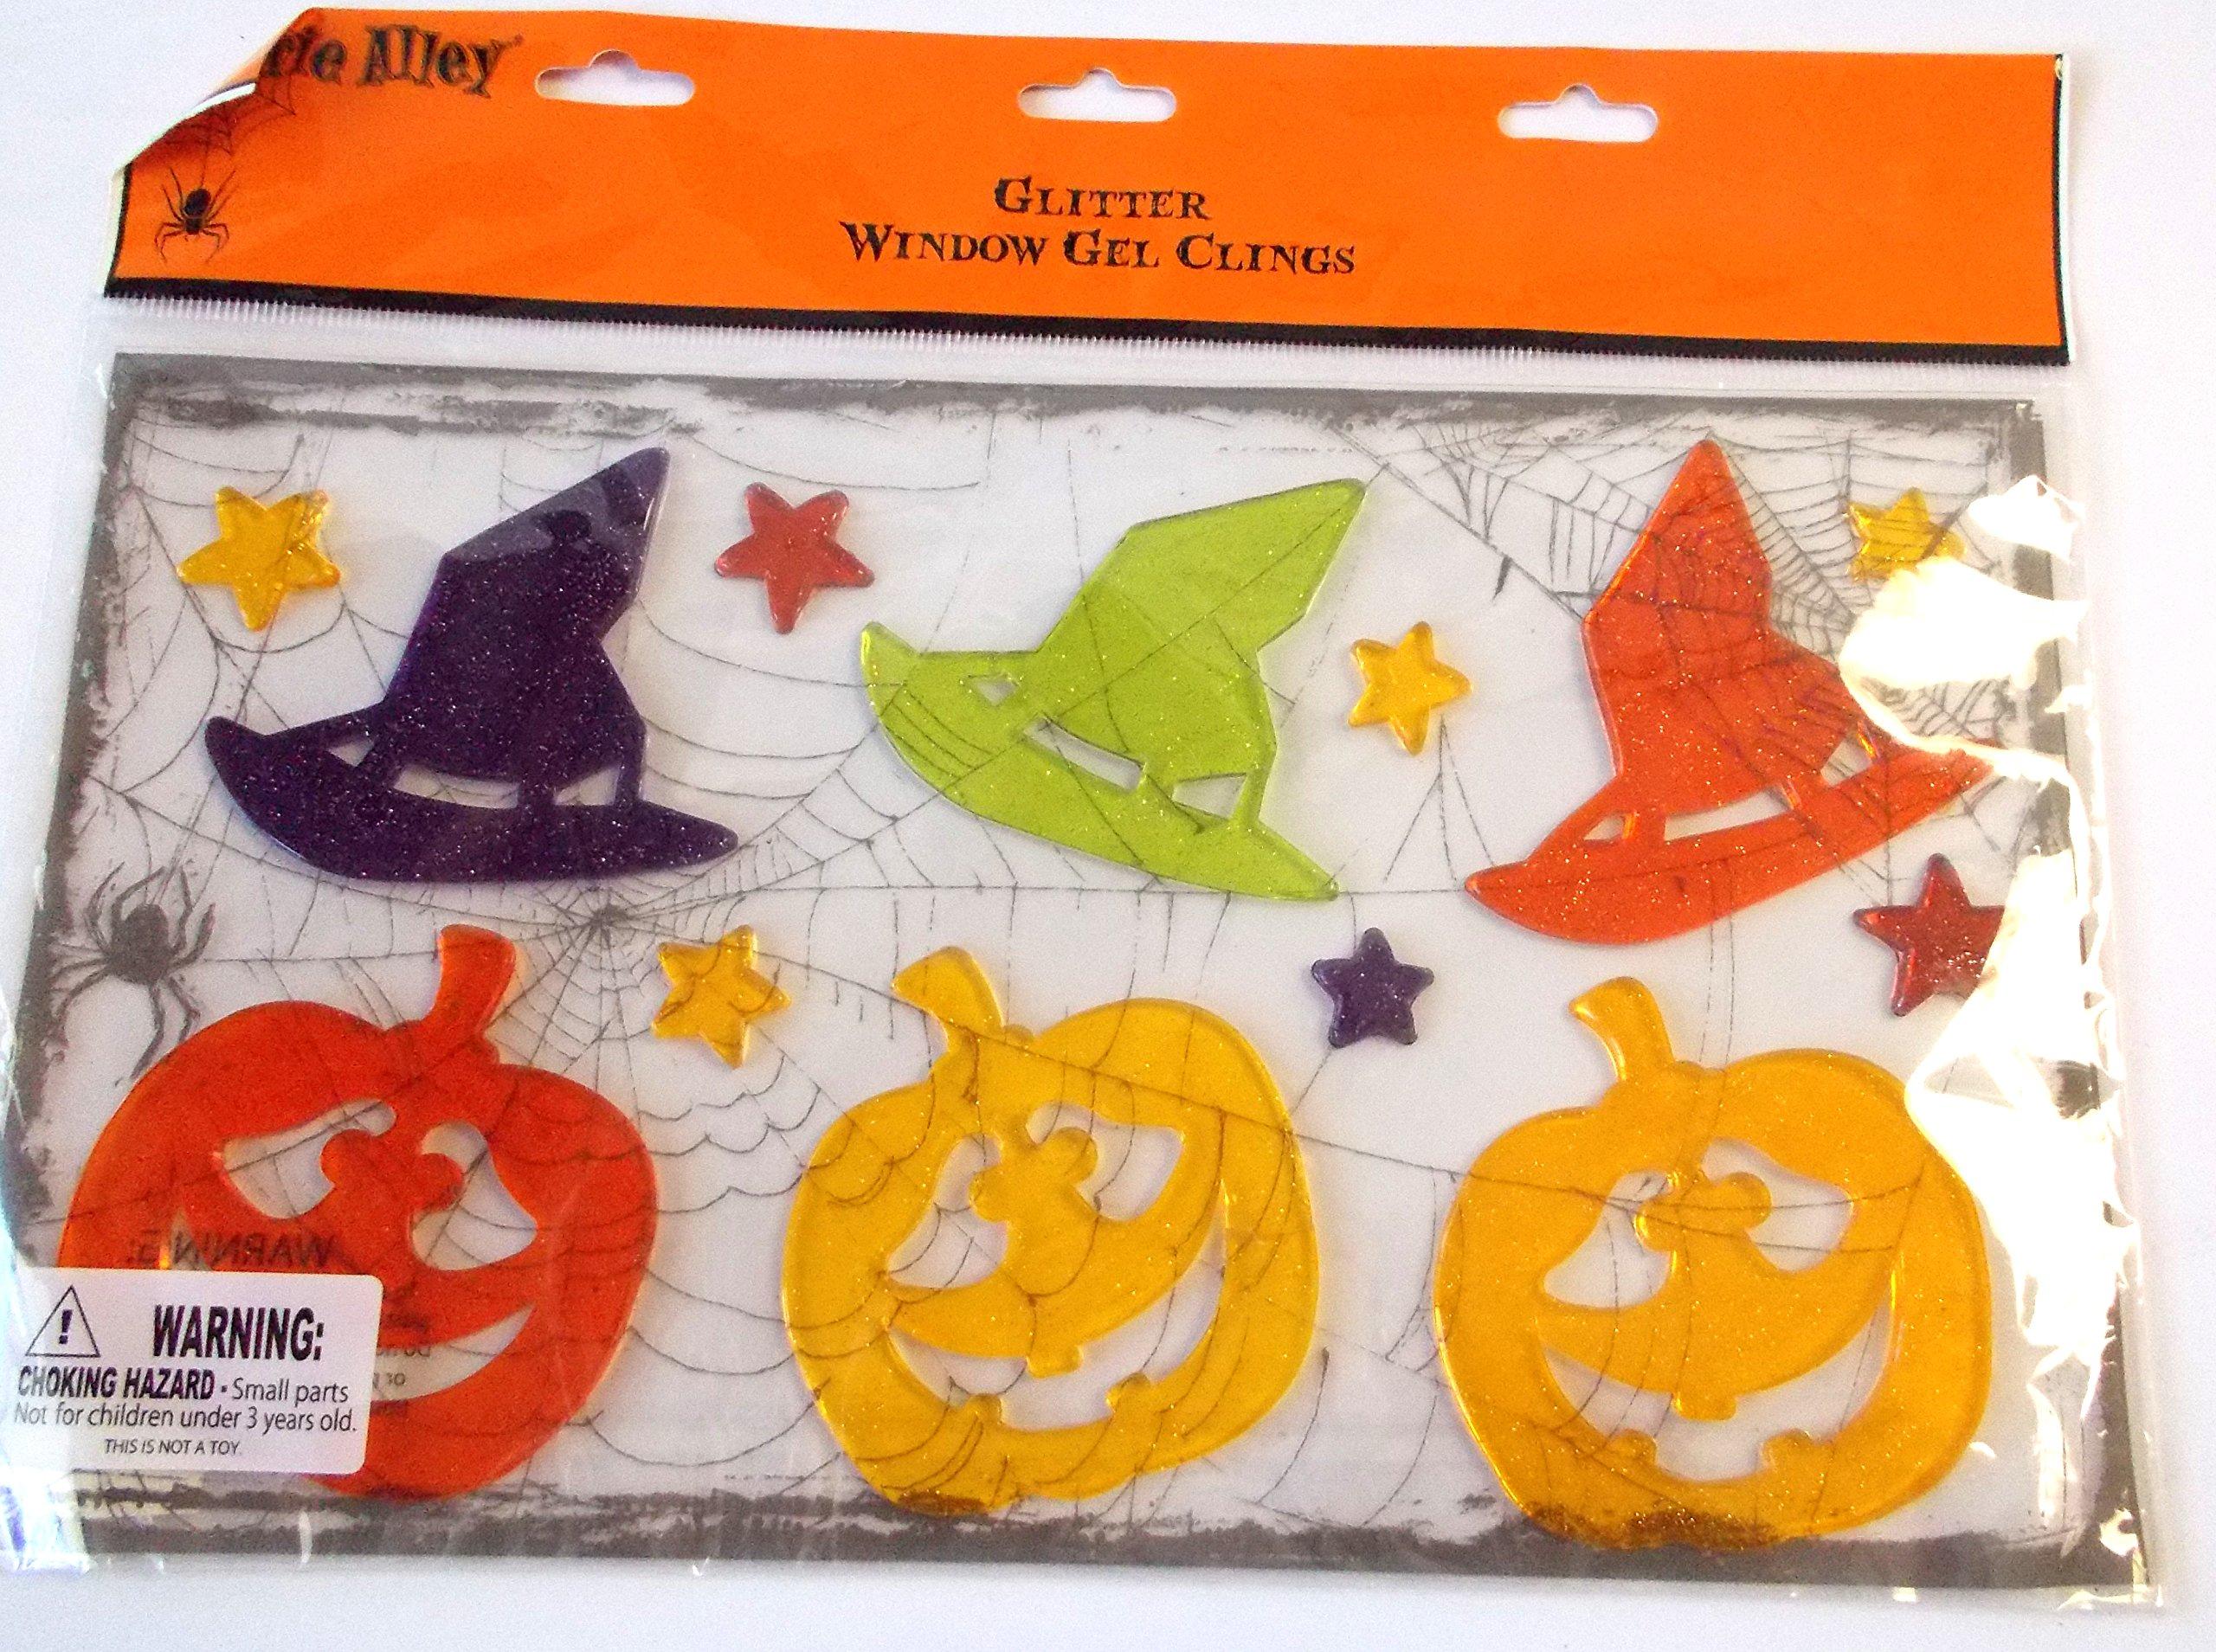 Glitter Witch Hat Pumpkins Halloween Gel Clings Window Mirror Decor NIP